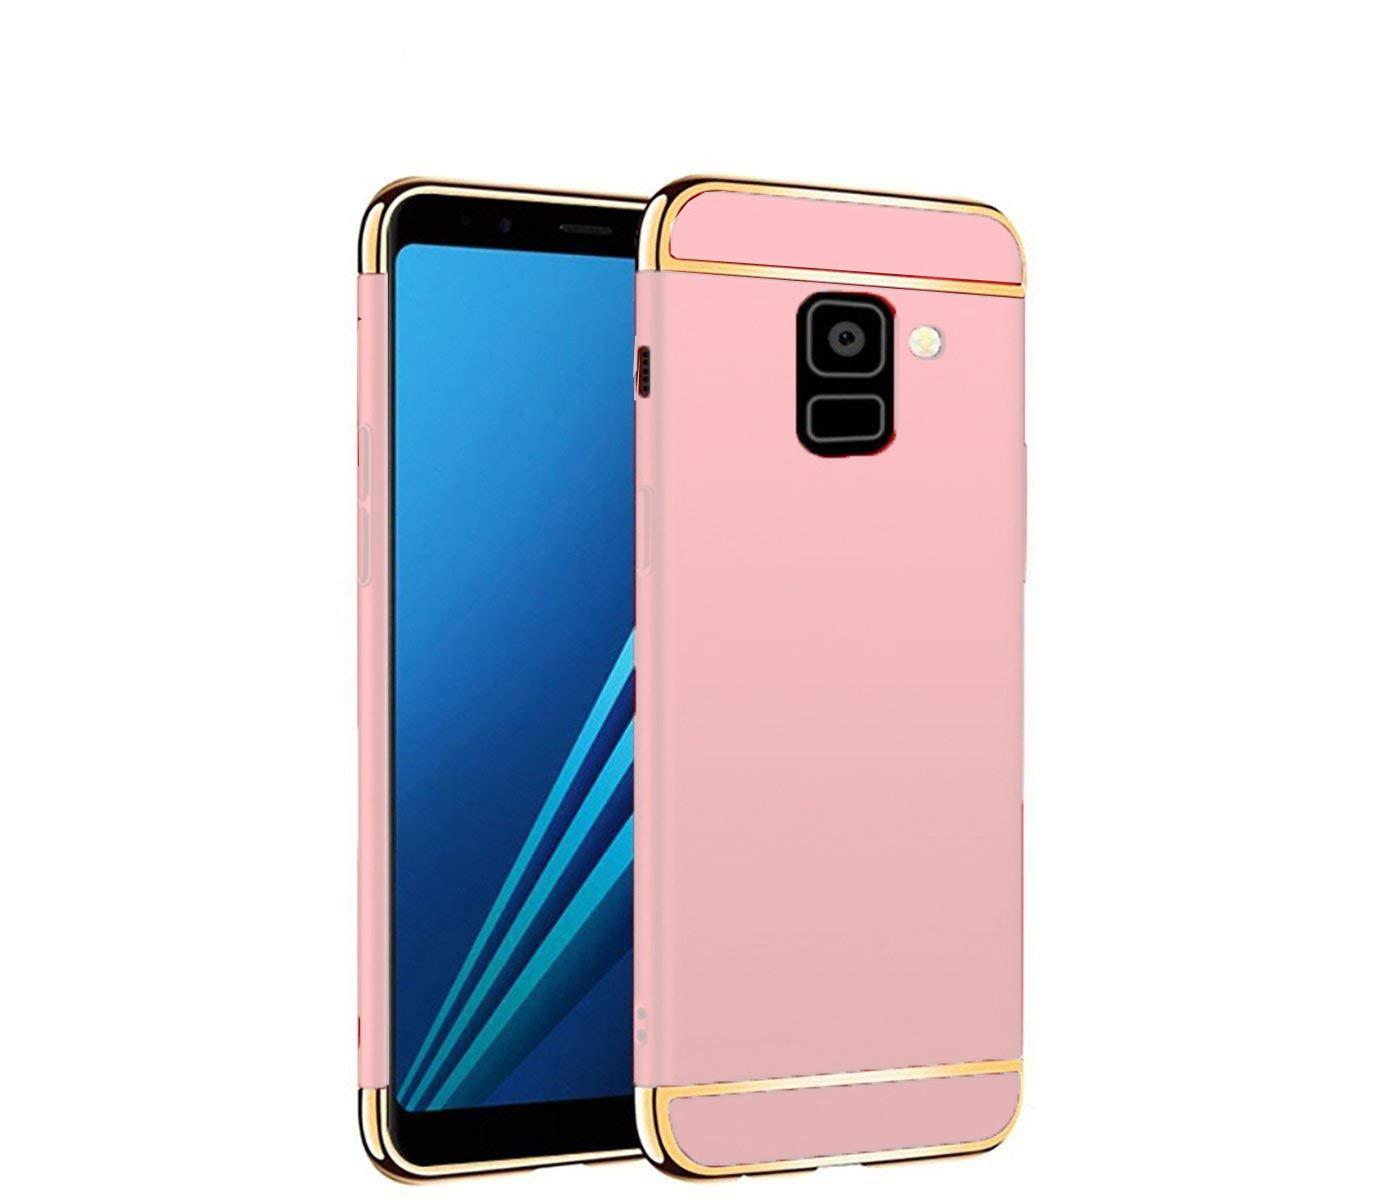 Samsung Galaxy A6 Plus 2018 J4 J6 A6 End 1 5 2021 1200 AM